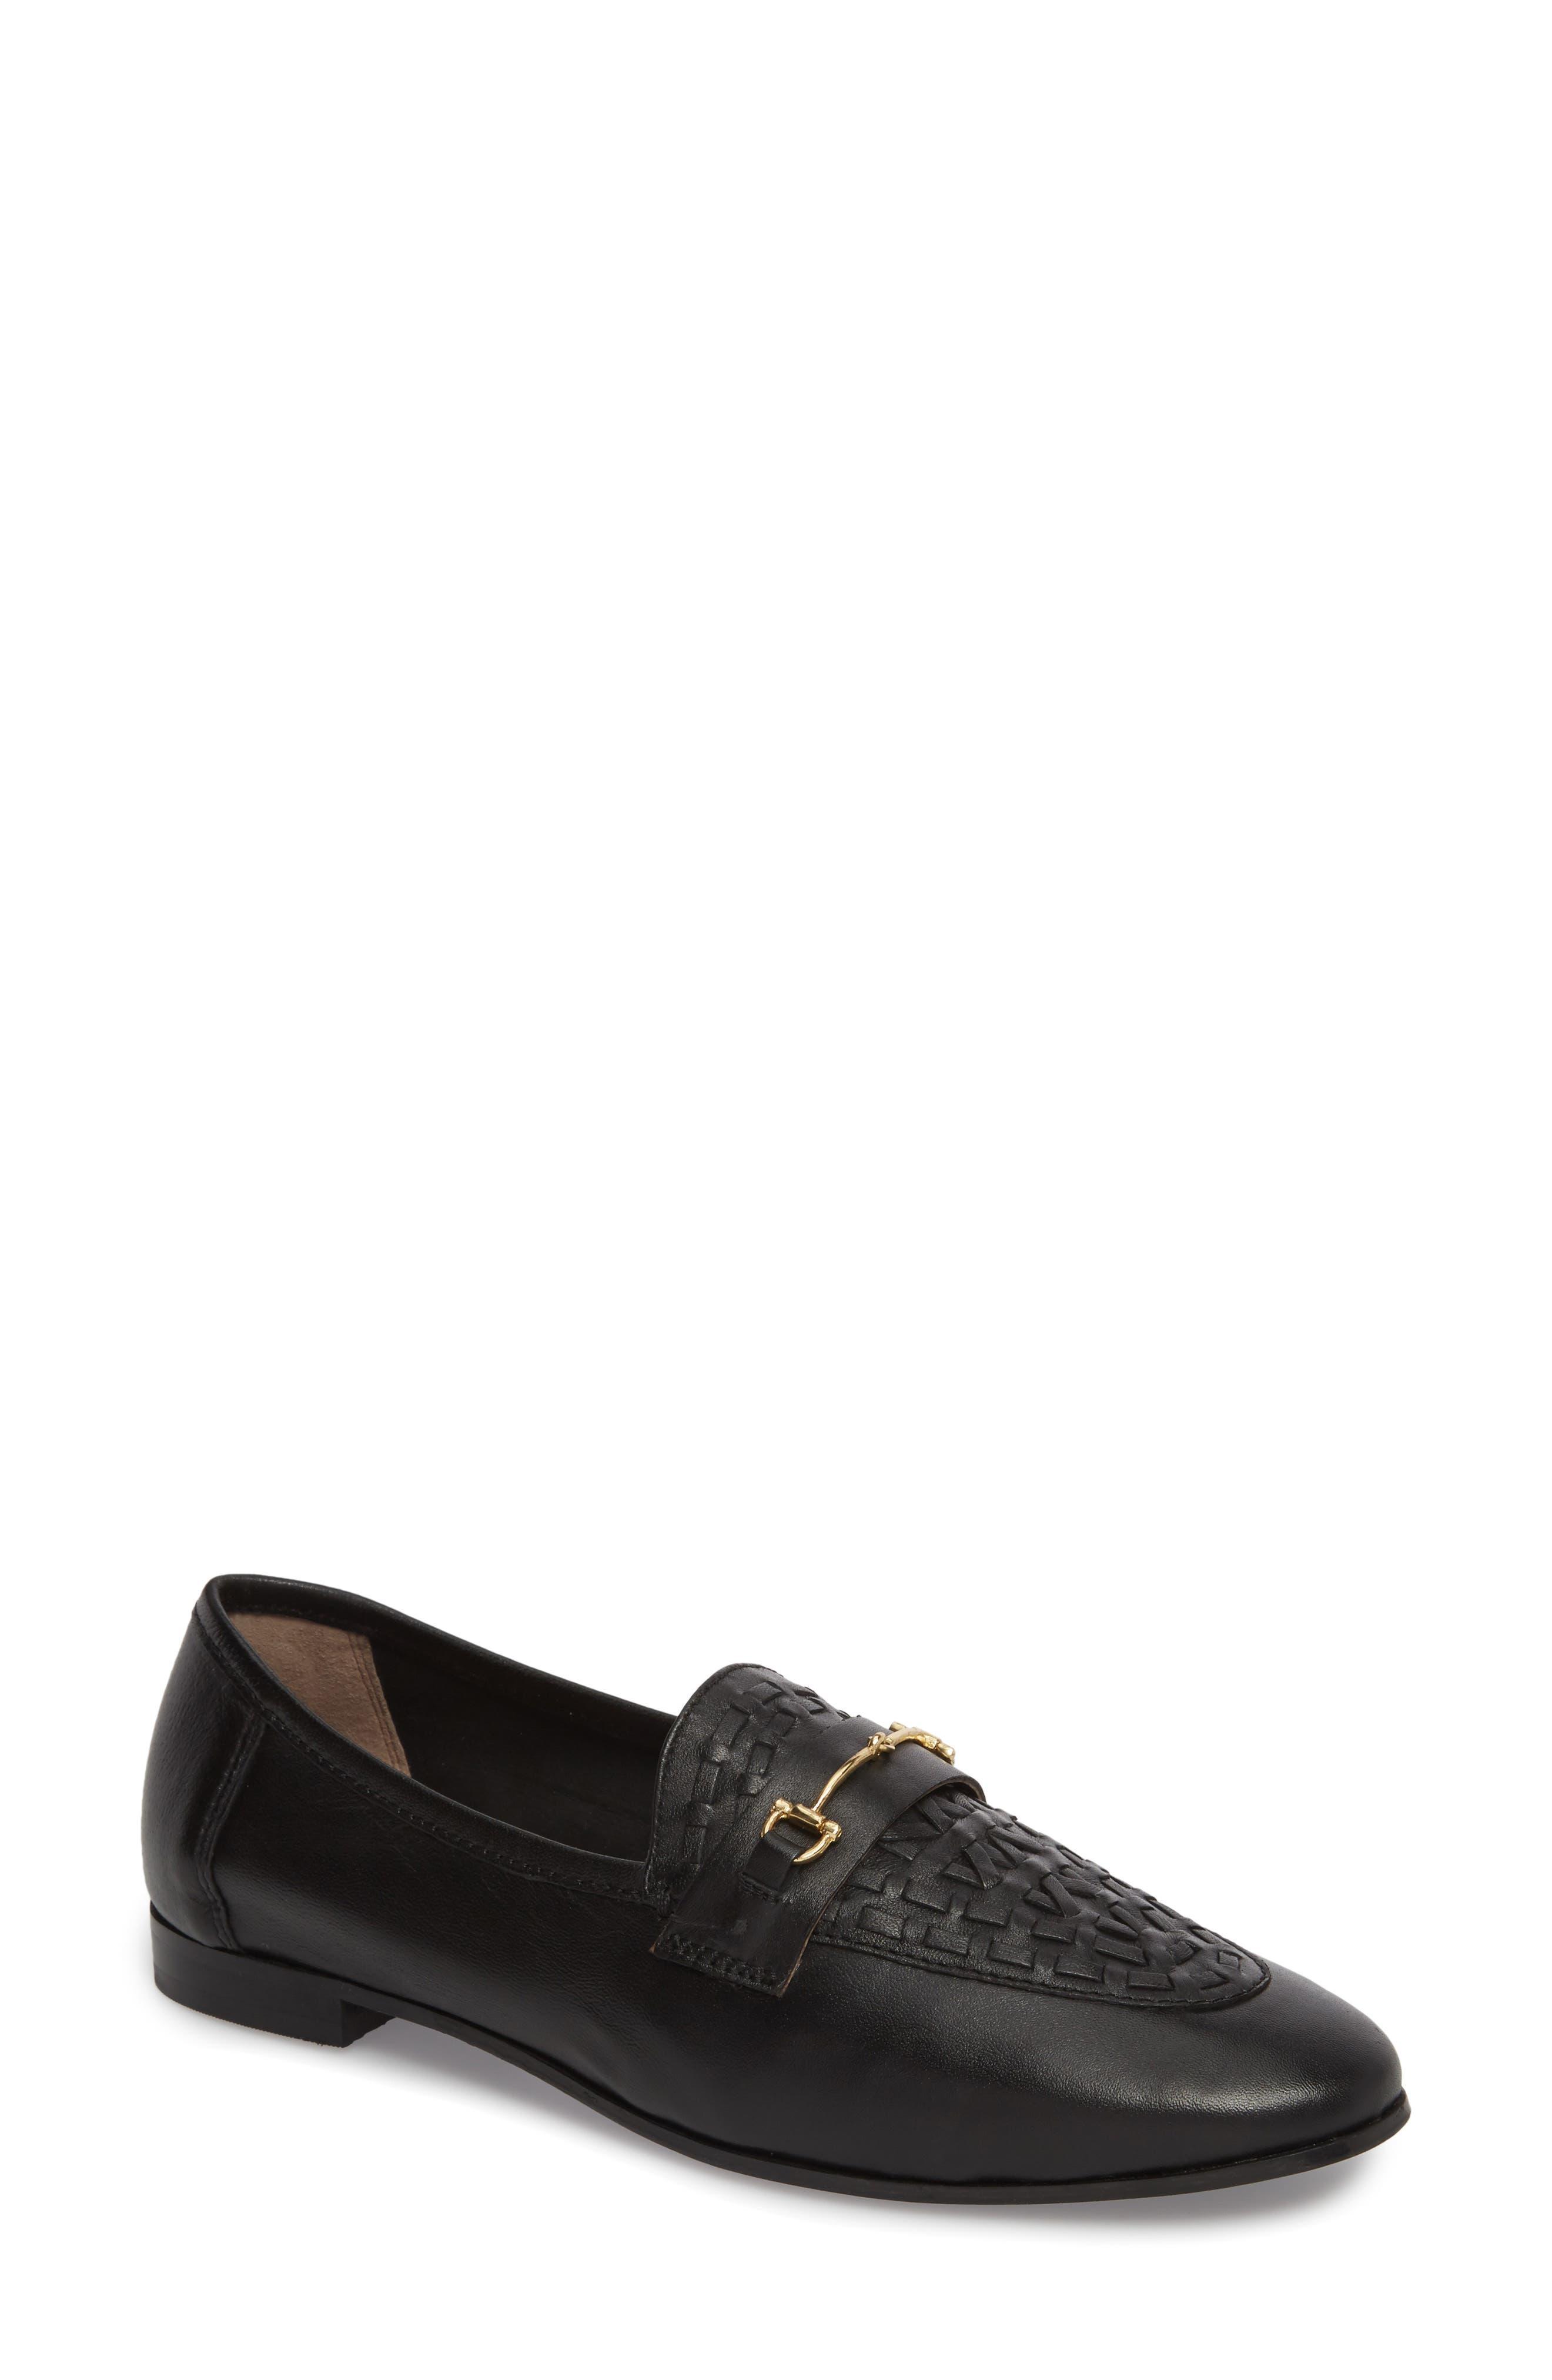 Kingley Woven Loafer,                         Main,                         color, Black